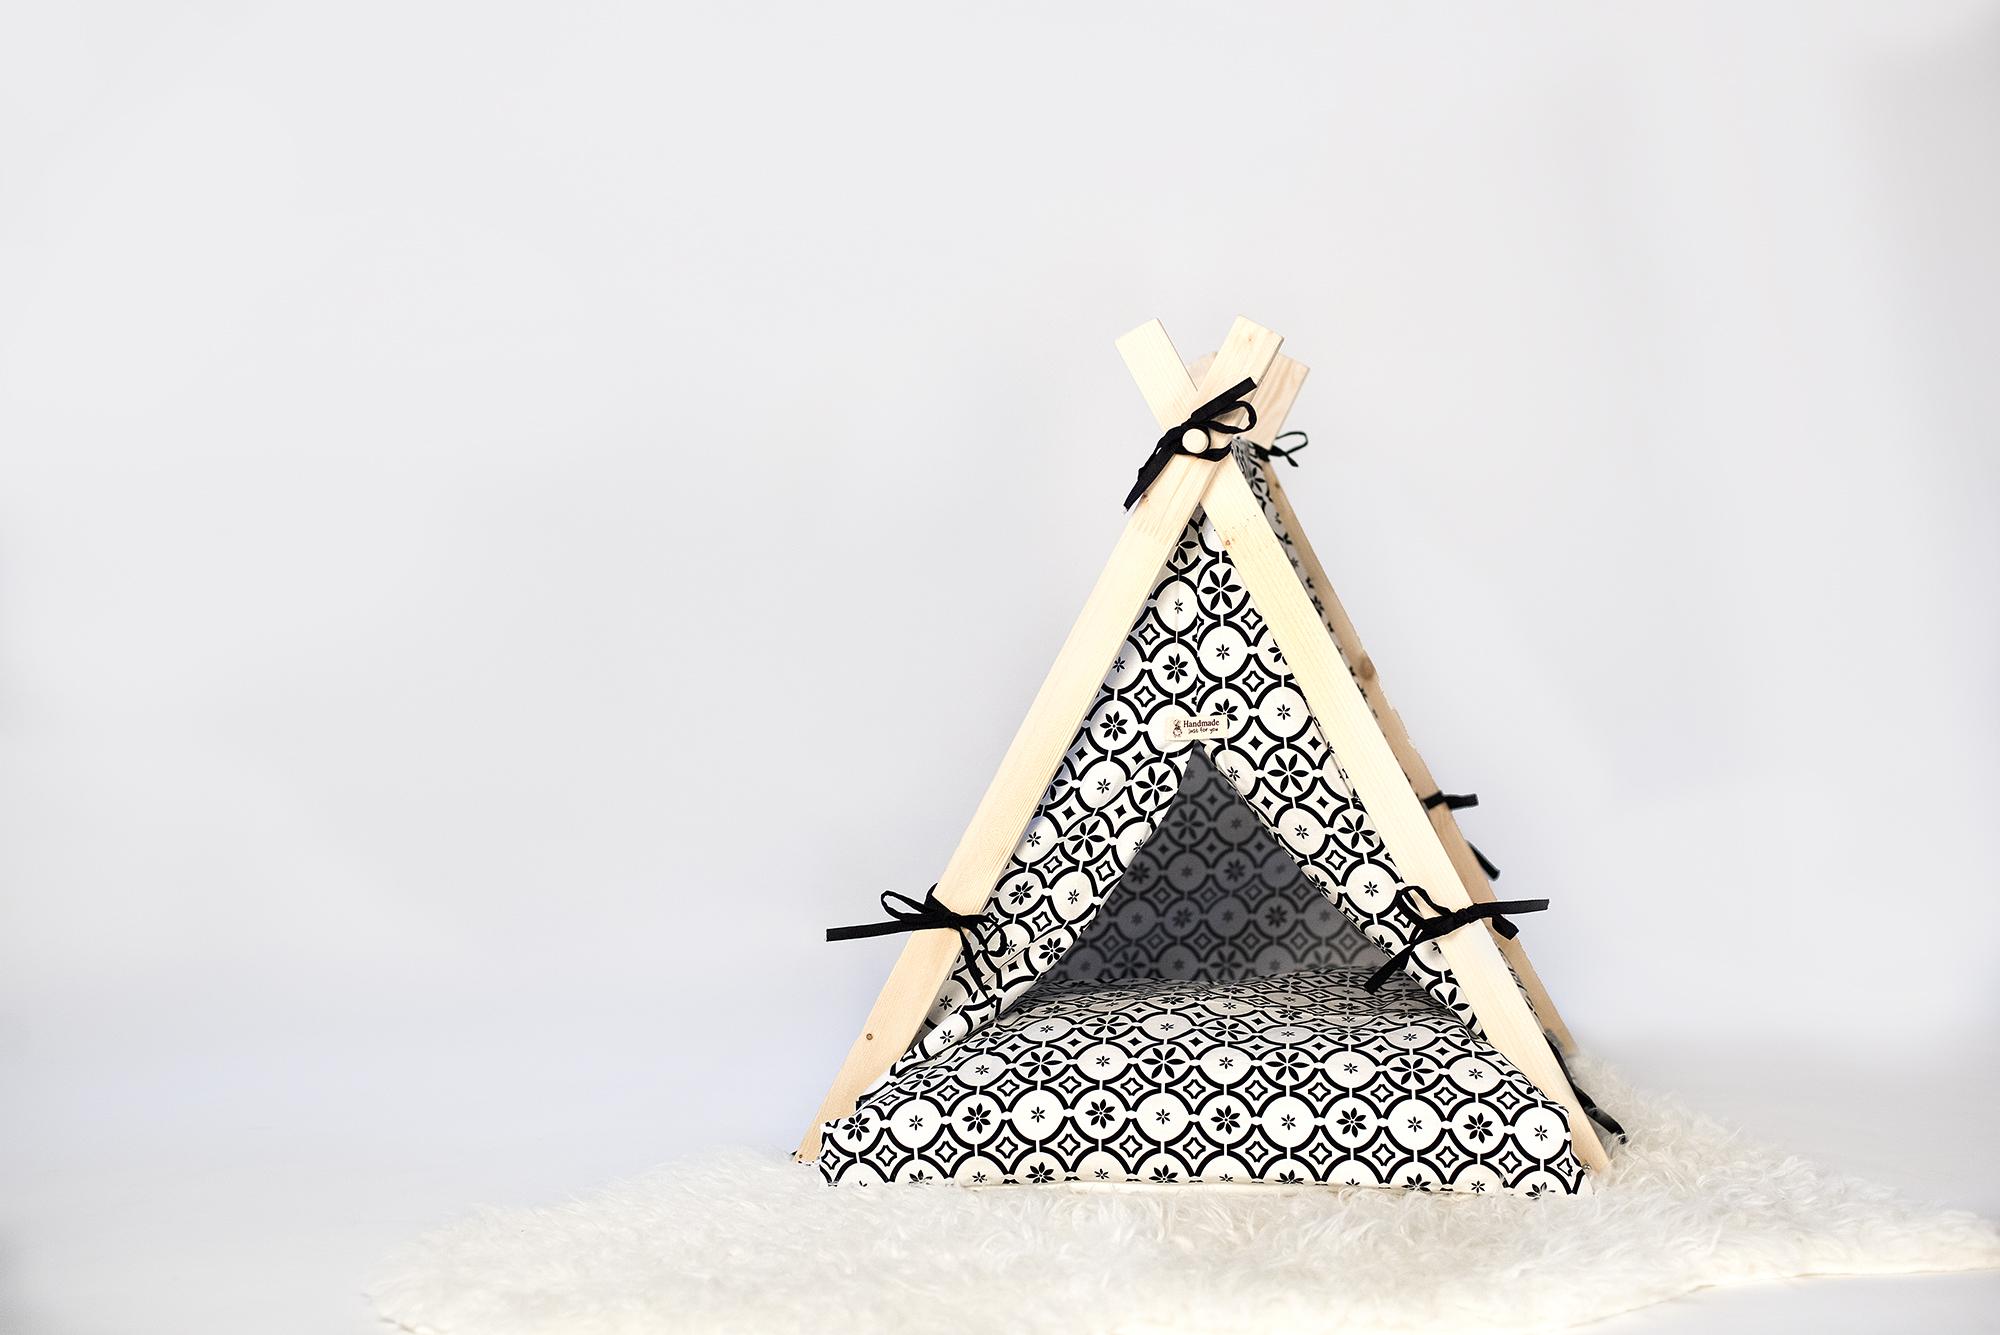 triangulartent-02-01.jpg